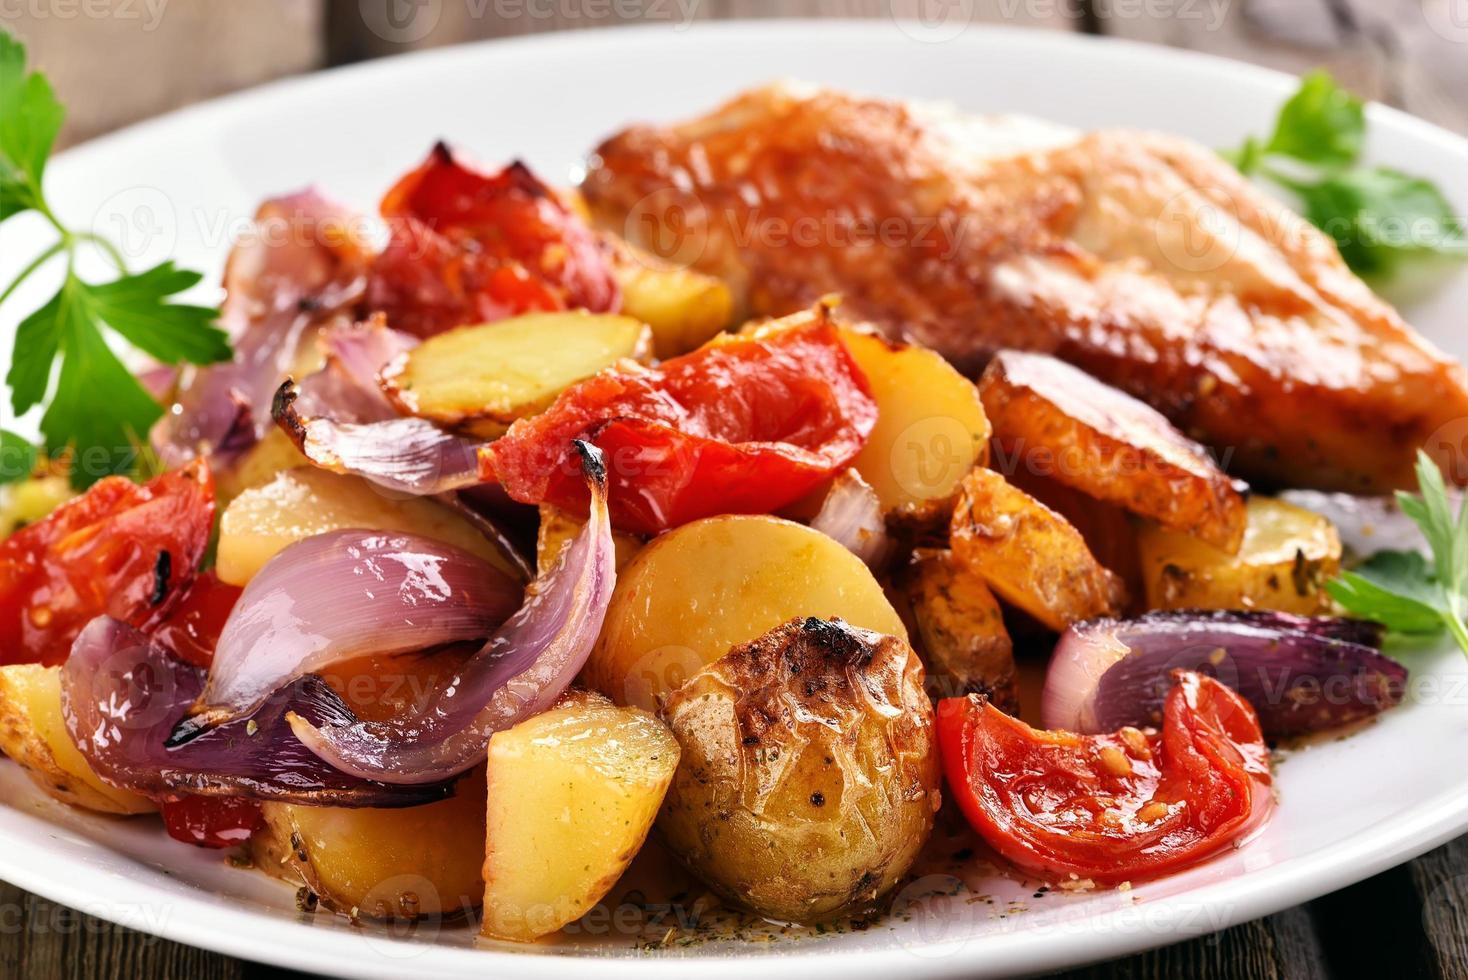 geroosterde groenten met kippenvlees foto